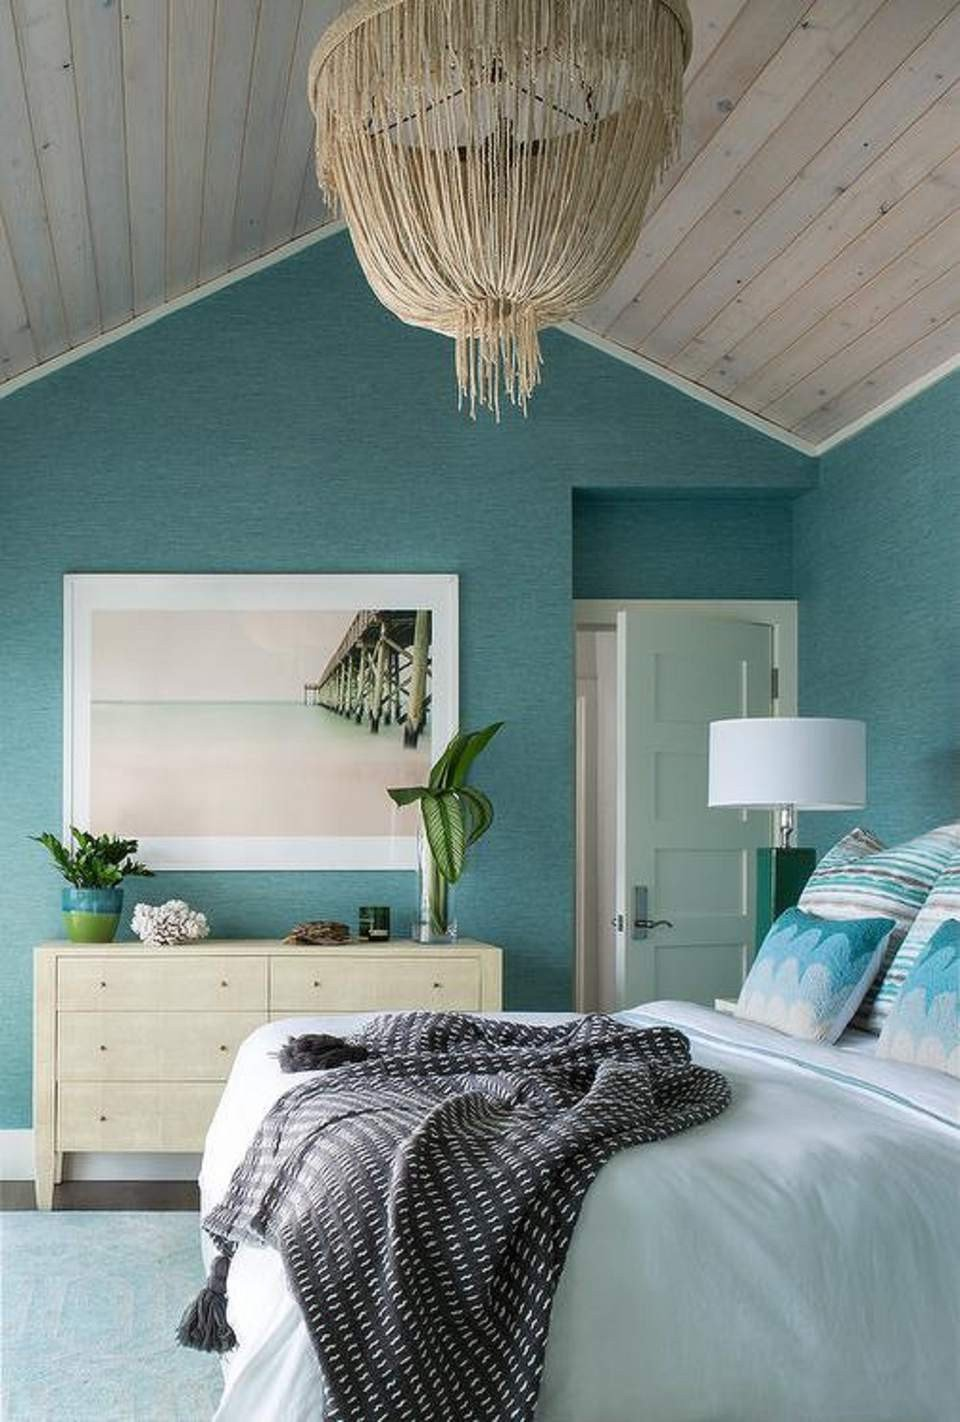 Teal and Black Bedroom Ideas Fresh 50 Gorgeous Beach Bedroom Decor Ideas